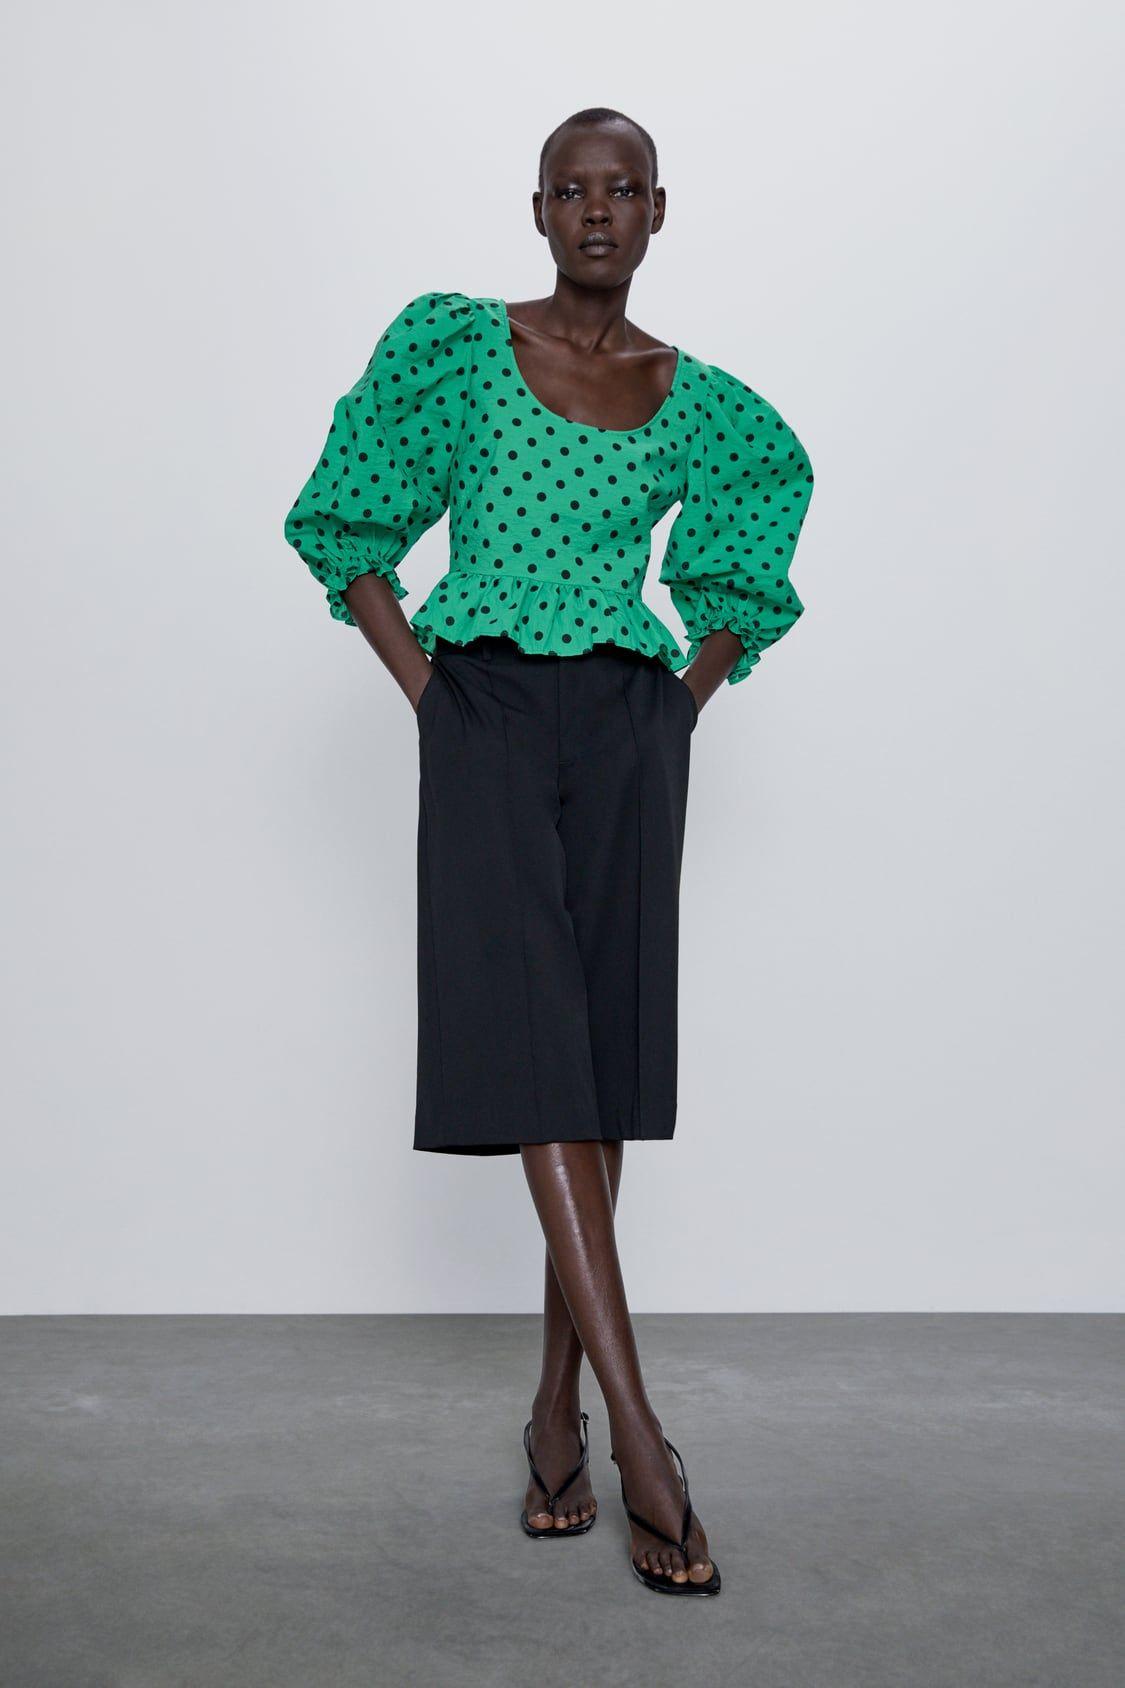 Blusa Estampado Lunares In 2020 Printed Blouse Polka Dot Print Stylish Shirts